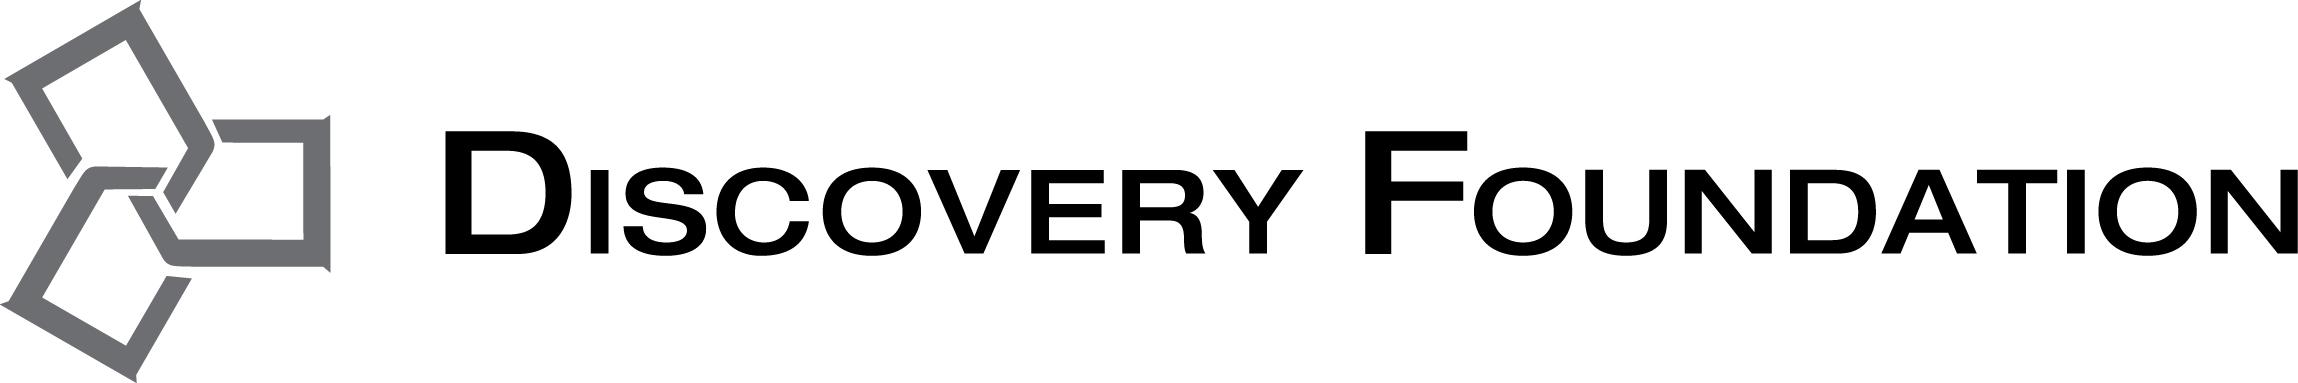 discovery-foundation-logo